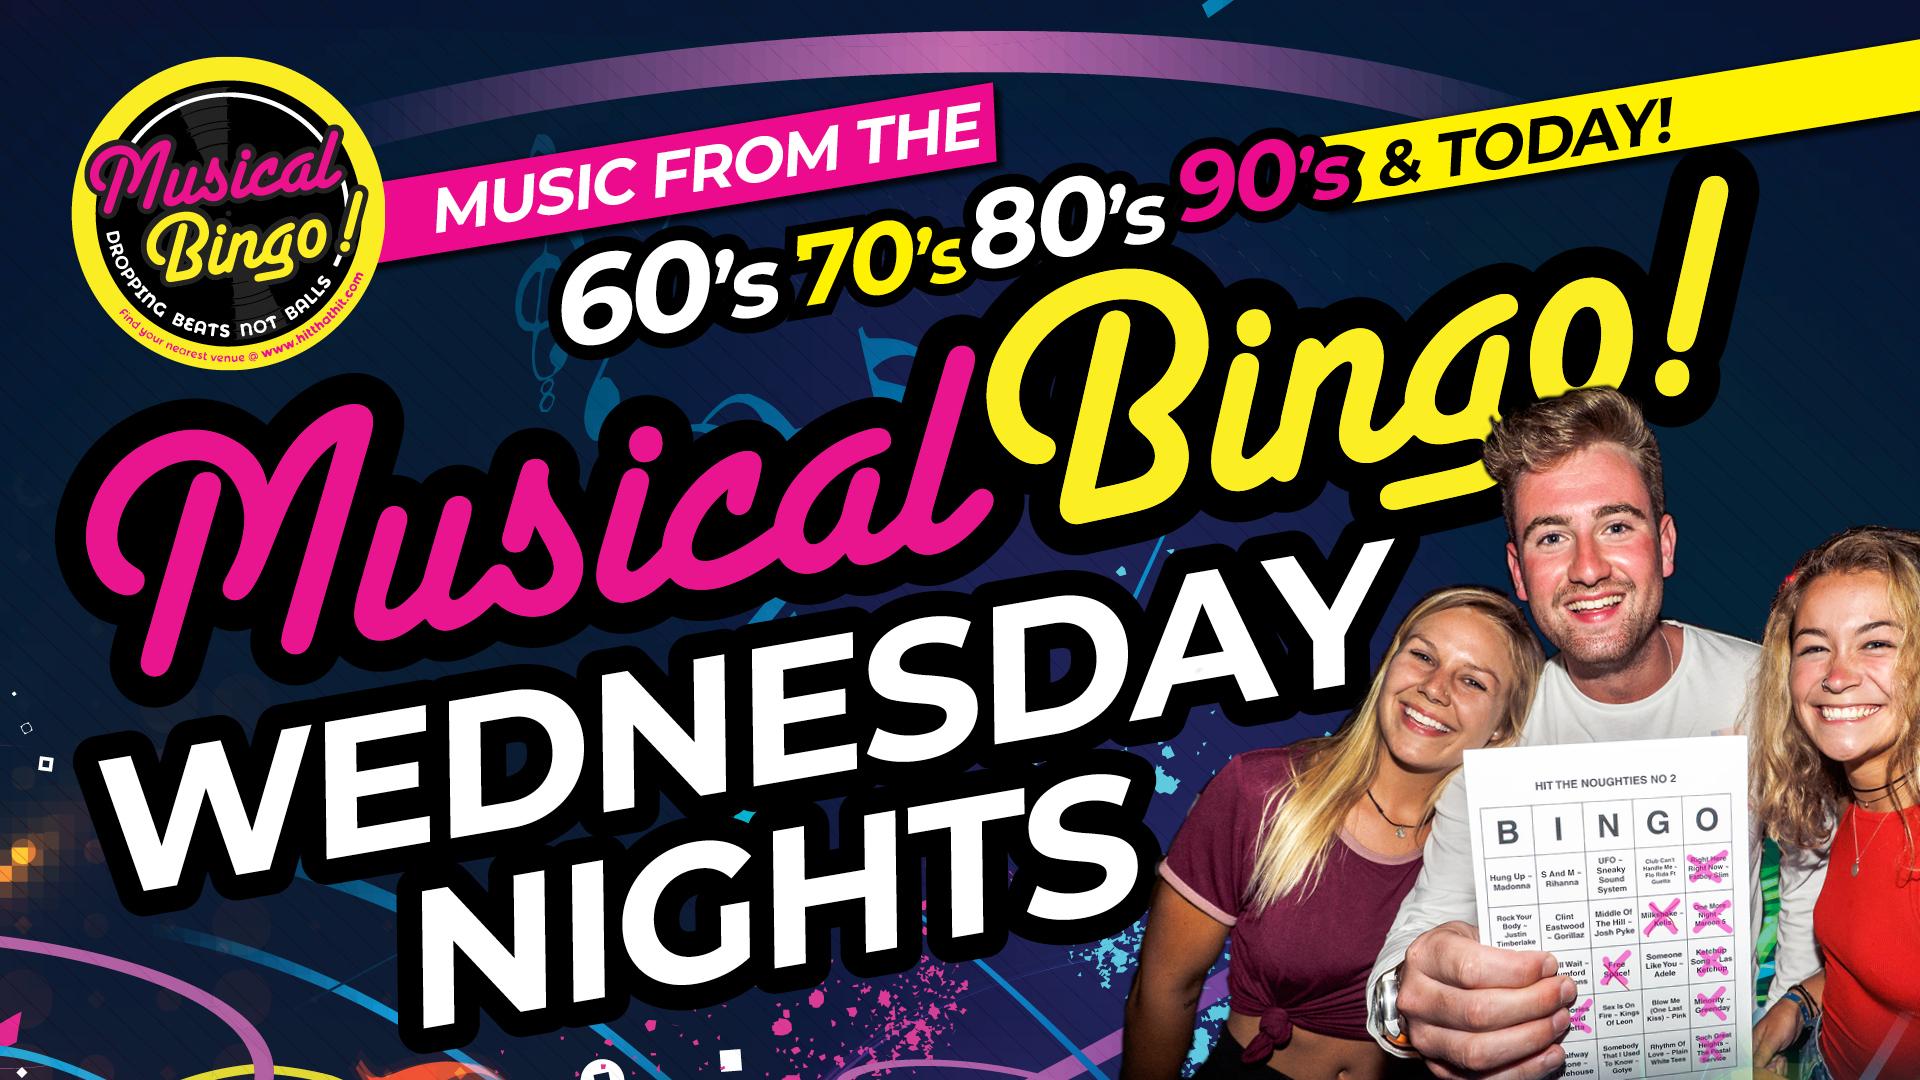 Musical Bingo Nightlife Graphic - Wednesday.jpg